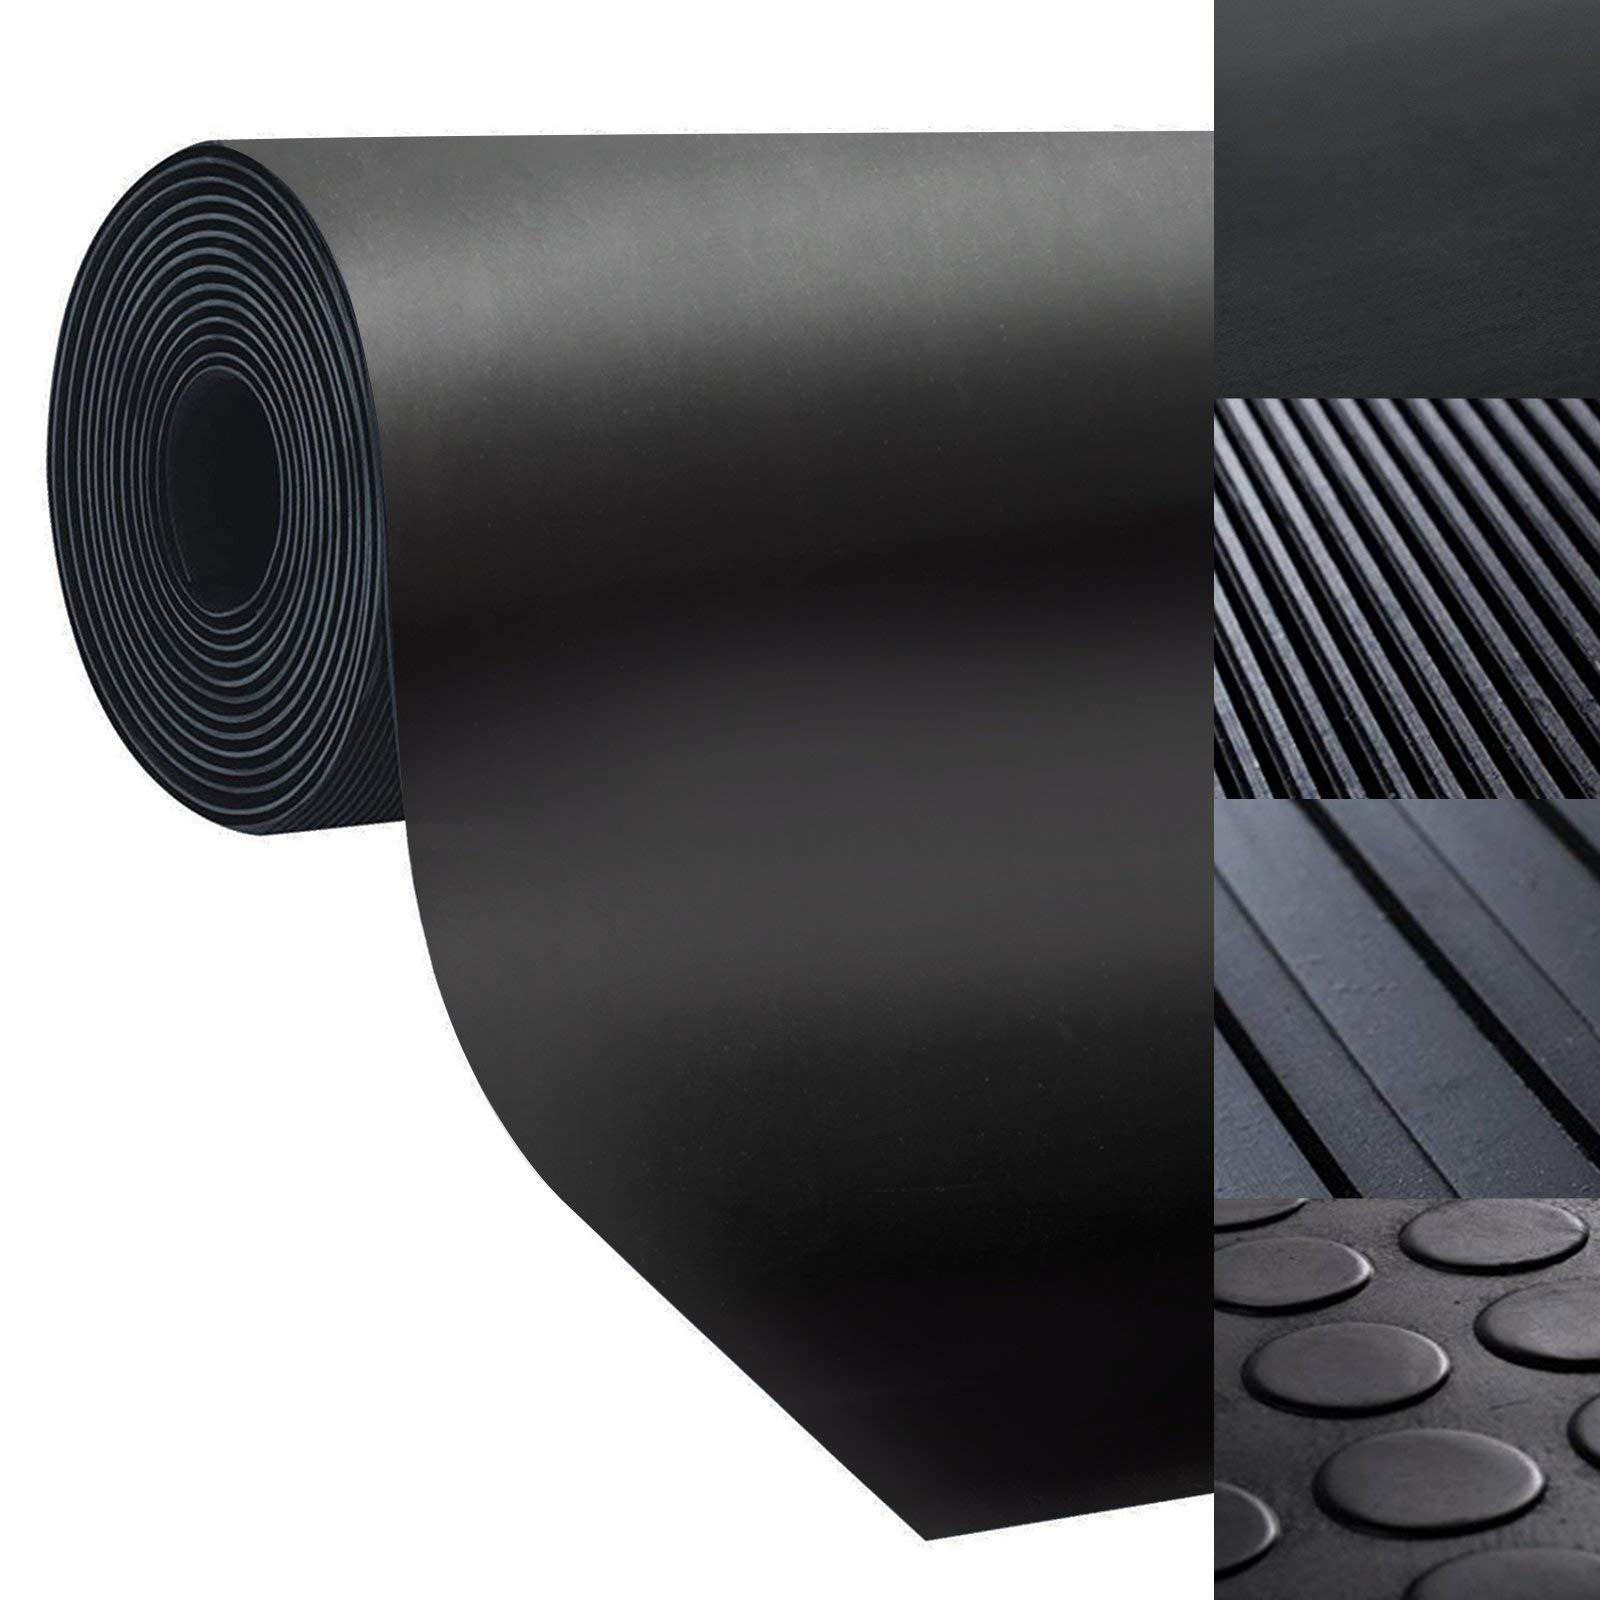 casa pura Rubber Floor Mat – Anti Slip Rubber Sheet | Suitable as Garage Floor Mat, Horse Stall Mat or Workbench Mat | Many Sizes to Choose from | 1/4'' Thick - 48'' x 6'